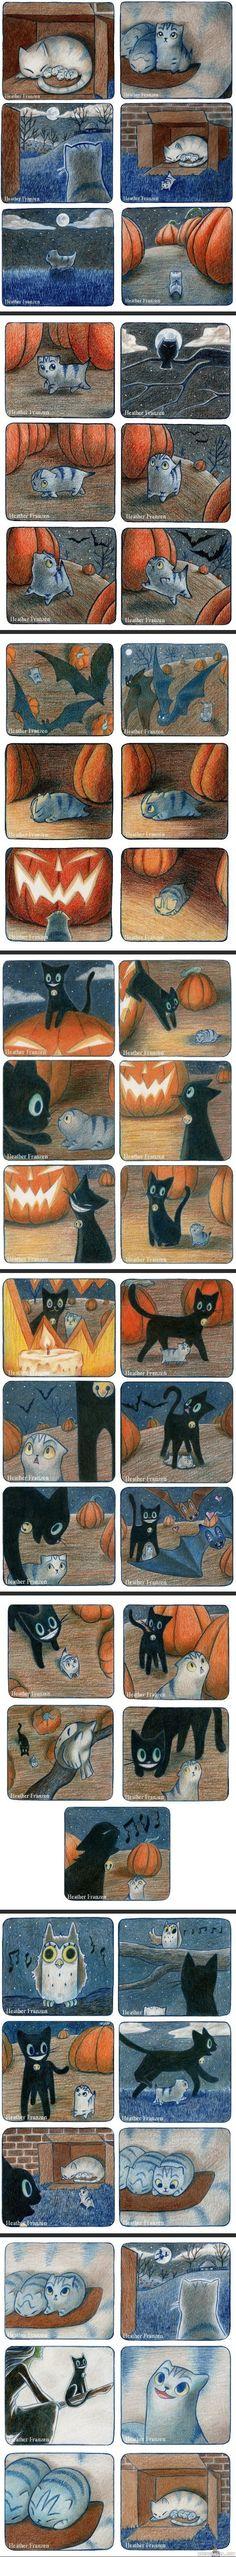 Kitten's nighttime adventure by Heather Franzen